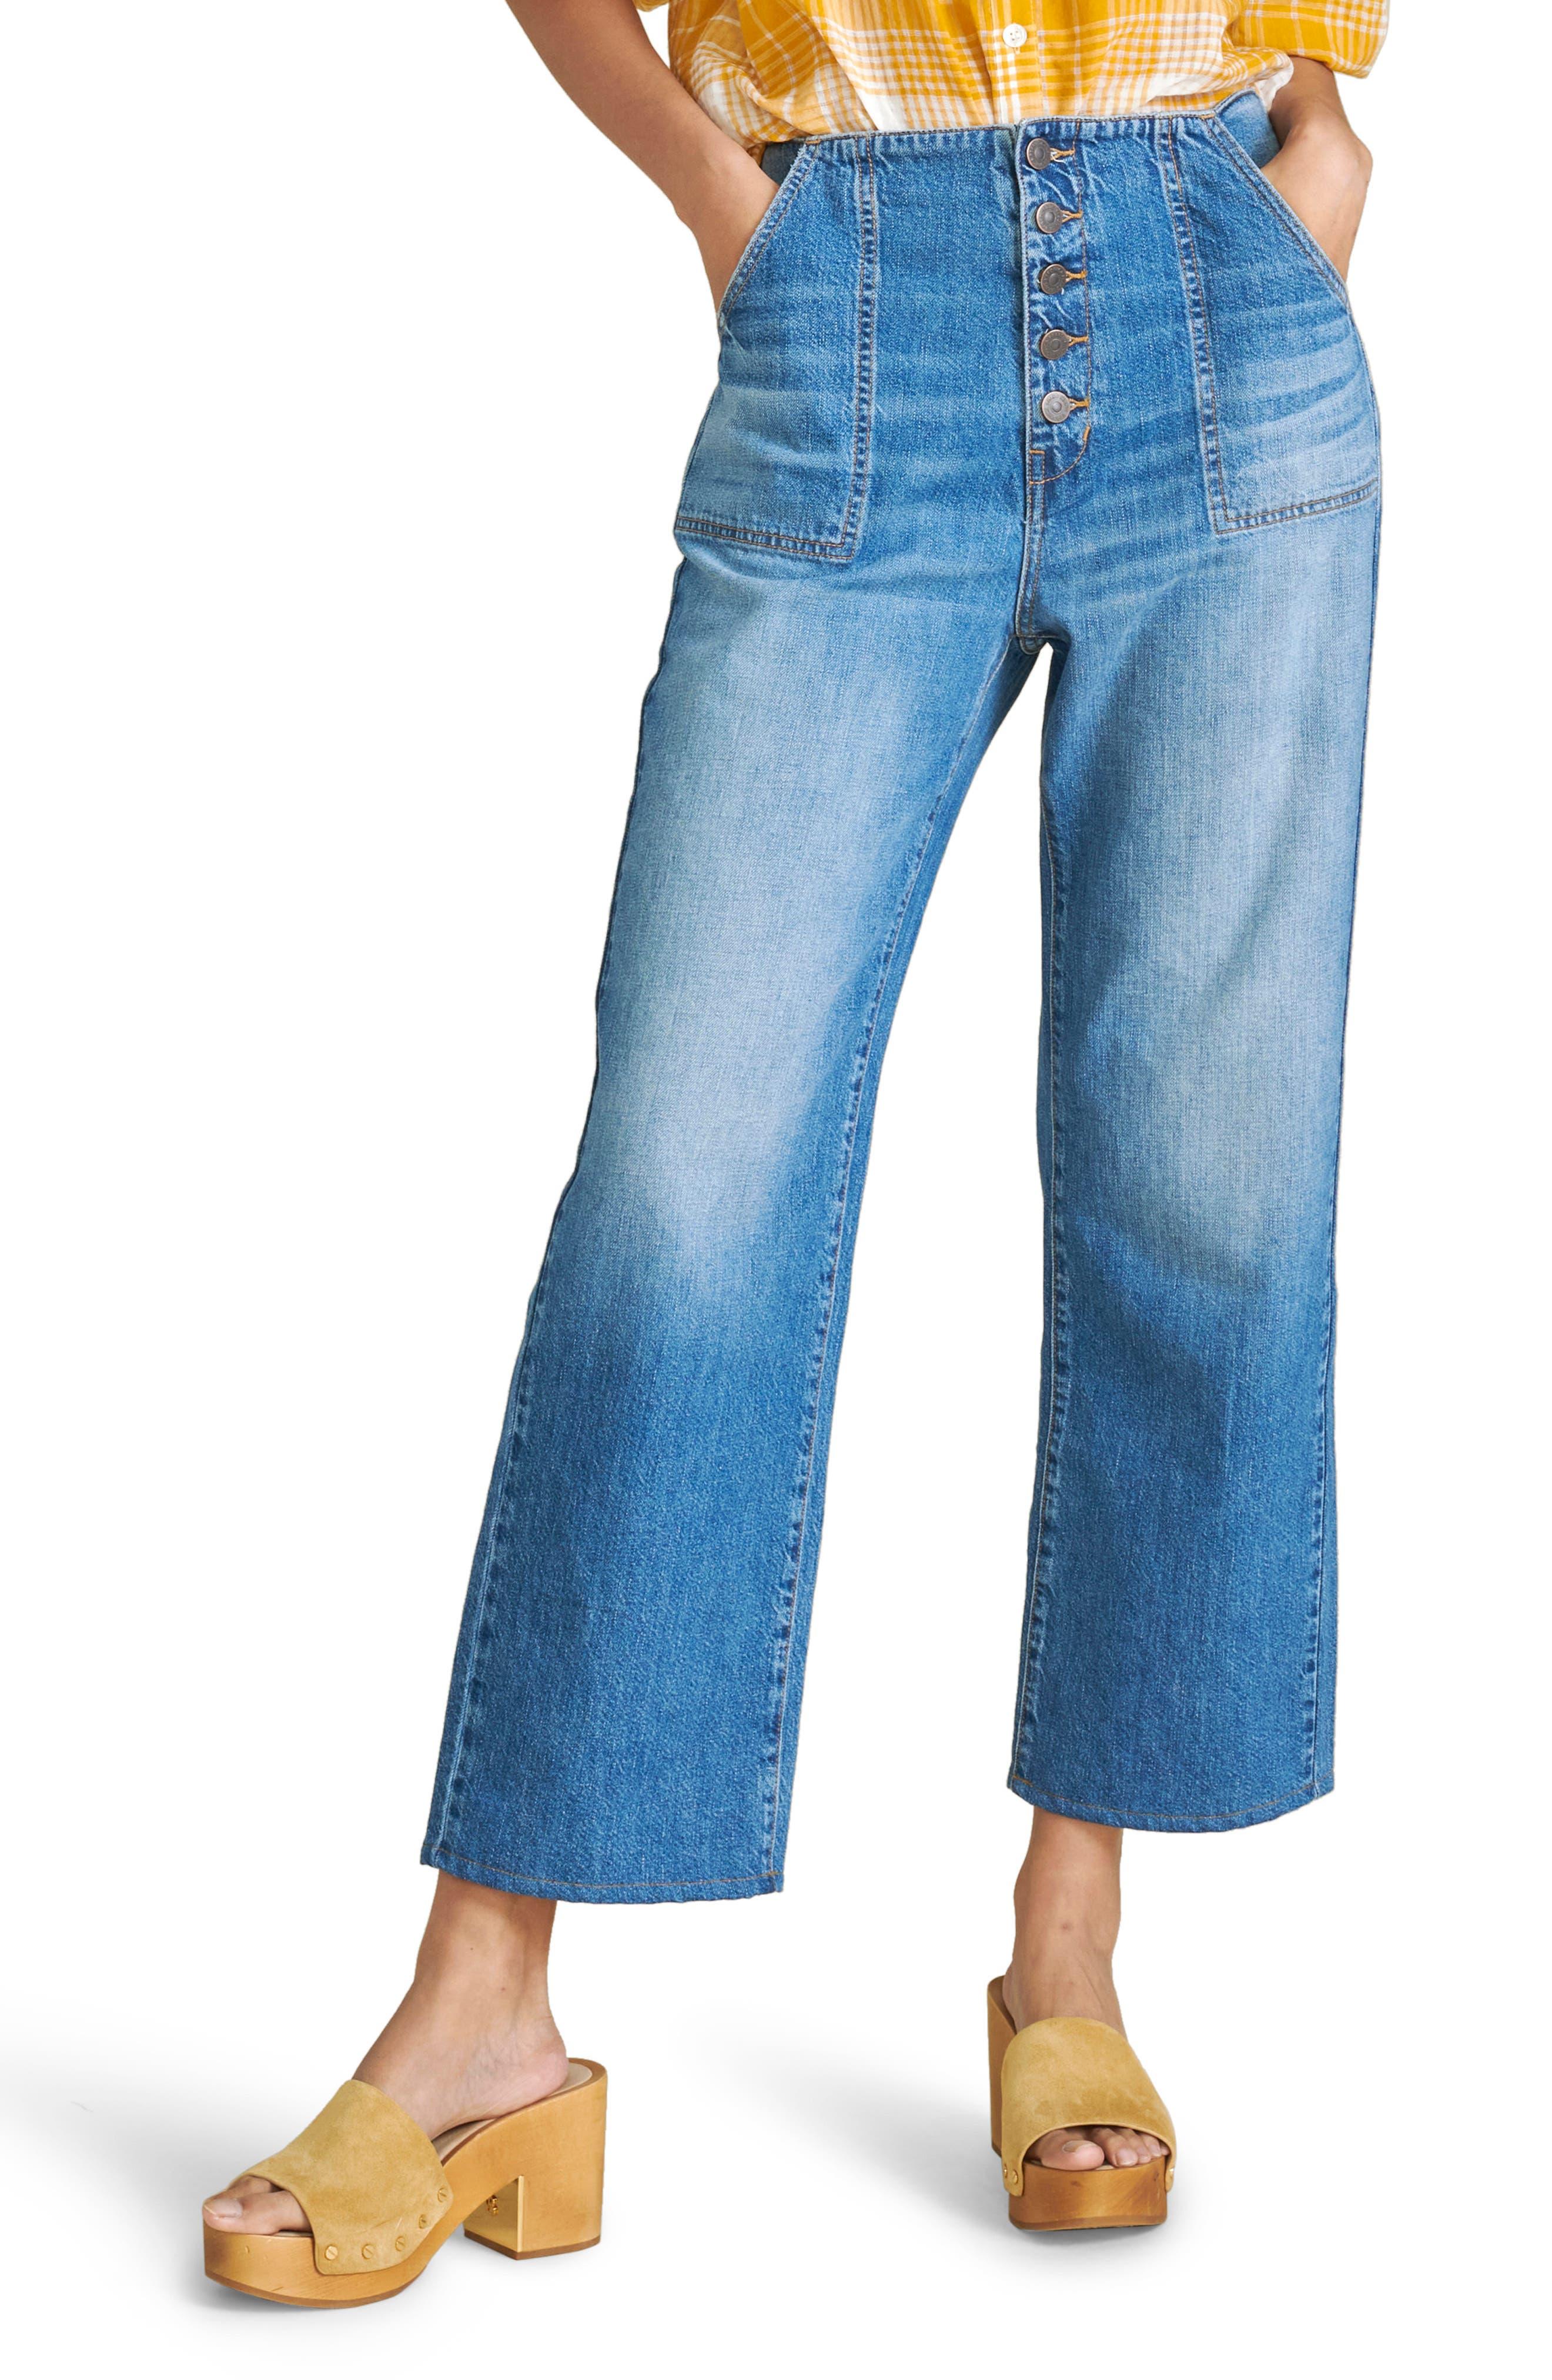 Ladies Women Girls Elastic Waist With Open Botton Leg Crop Short Trouser Bottom